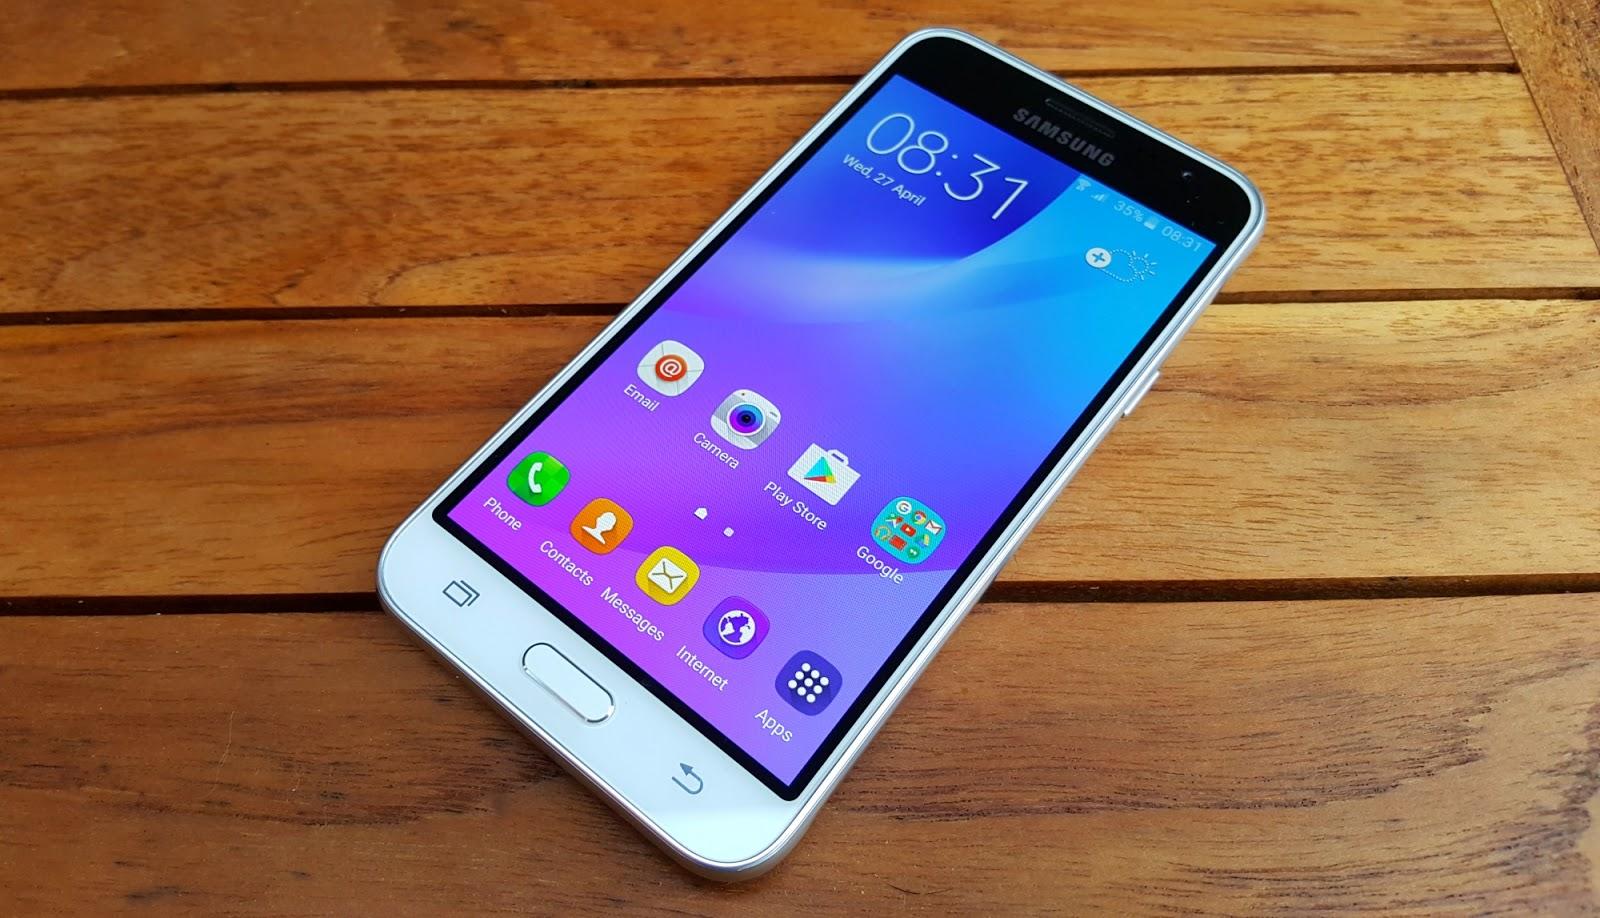 Quanta memoria RAM ha il Samsung Galaxy J3?